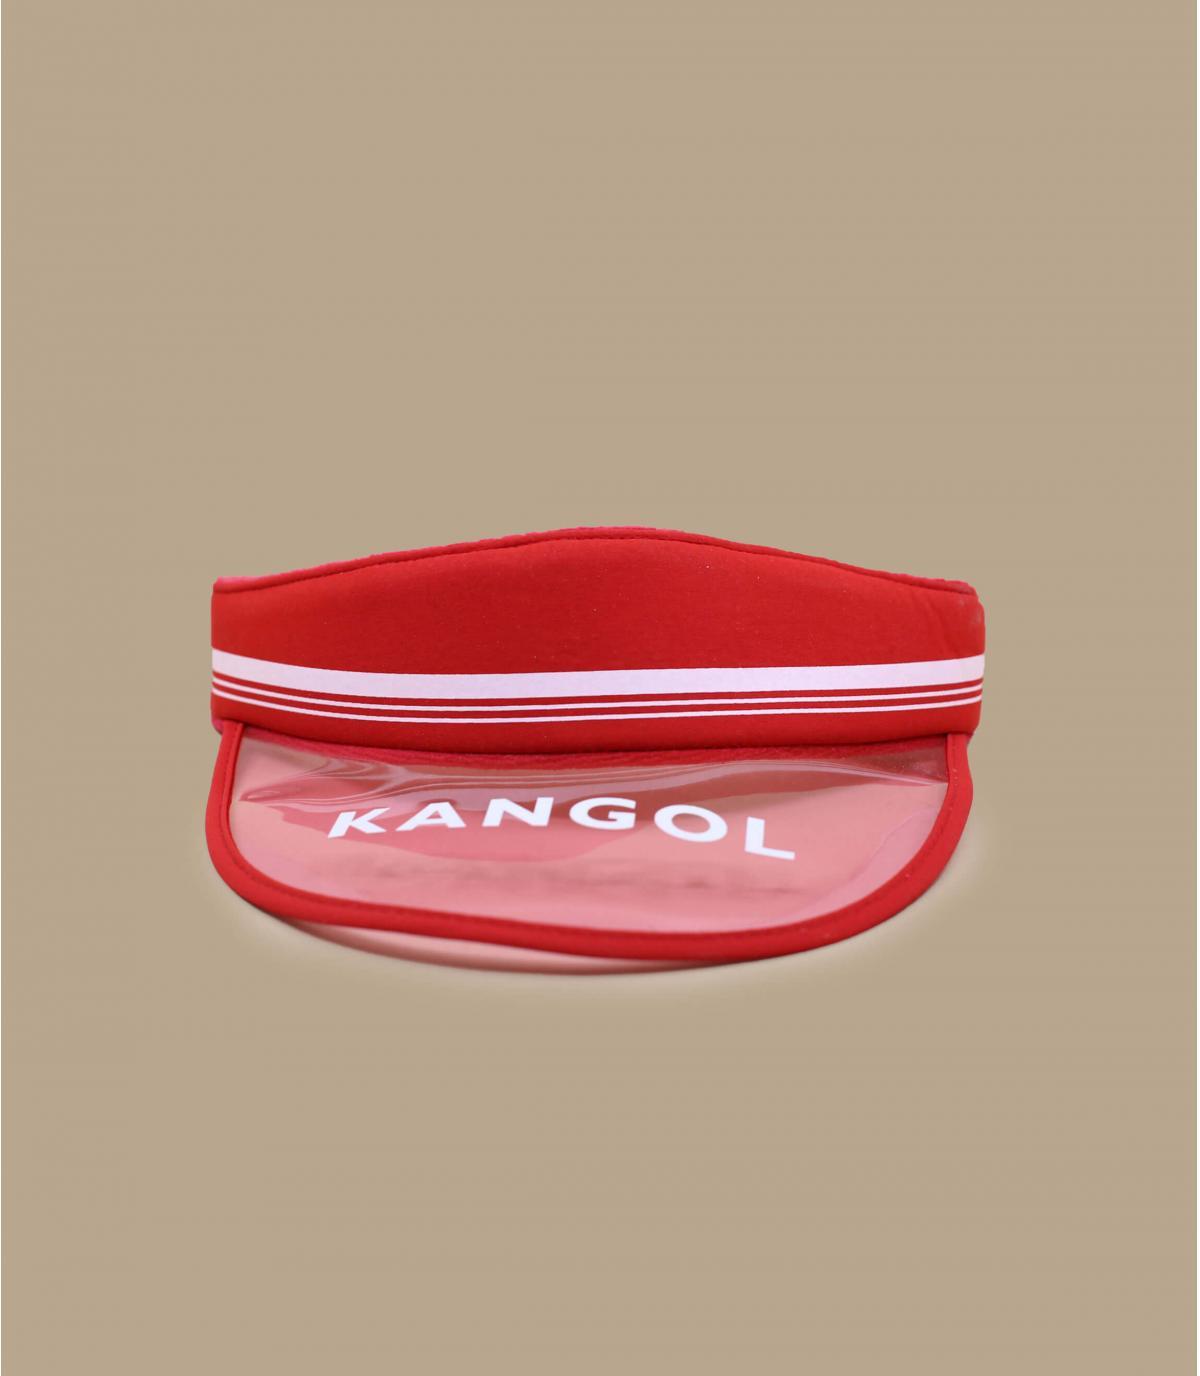 visière Kangol rouge